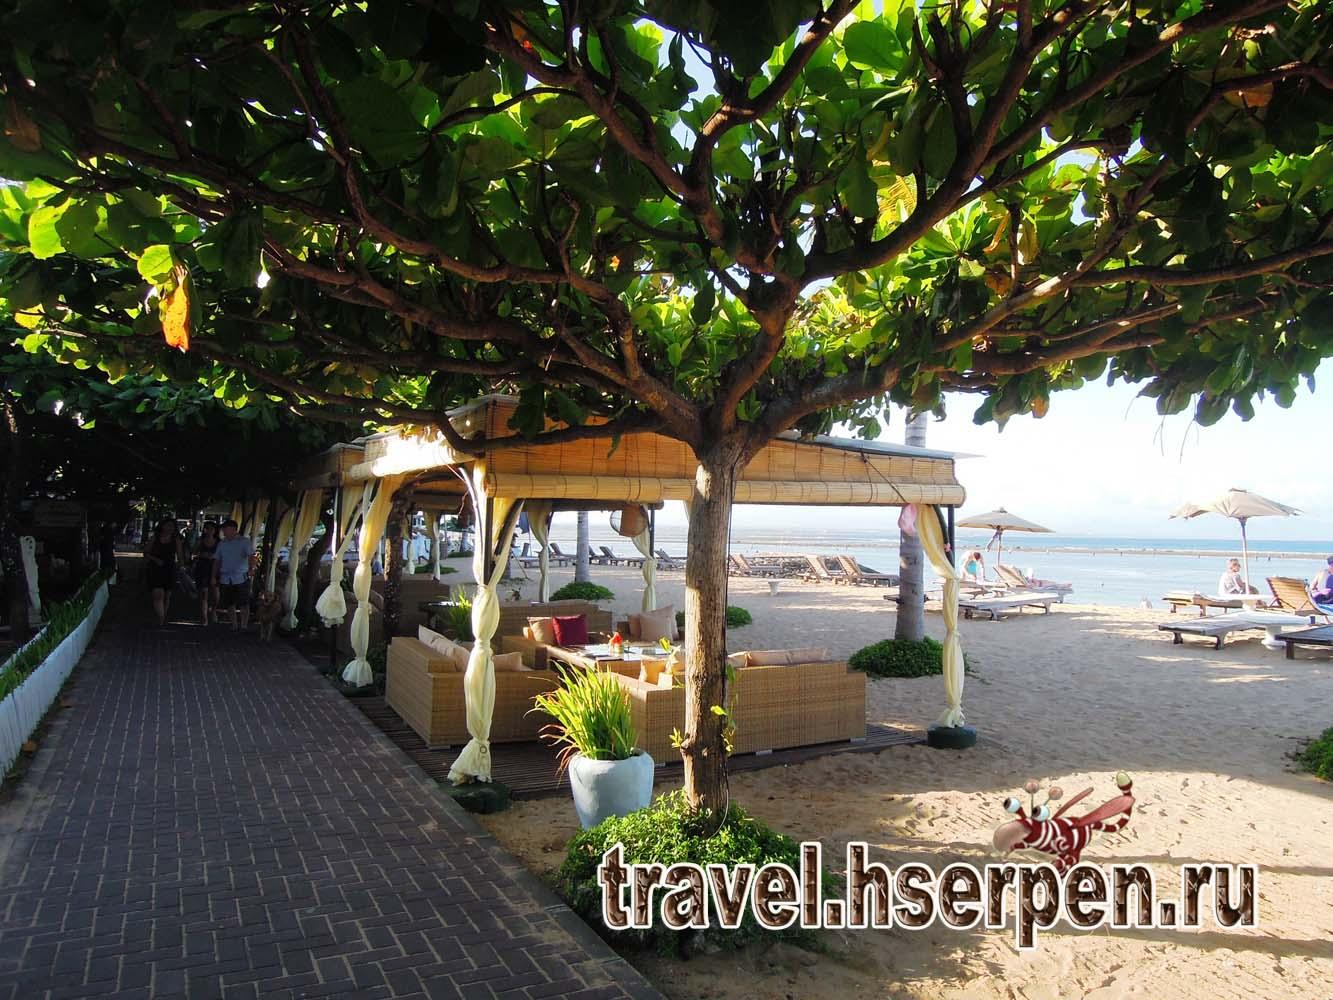 Остров Бали - какой вид отдыха предпочитаете?